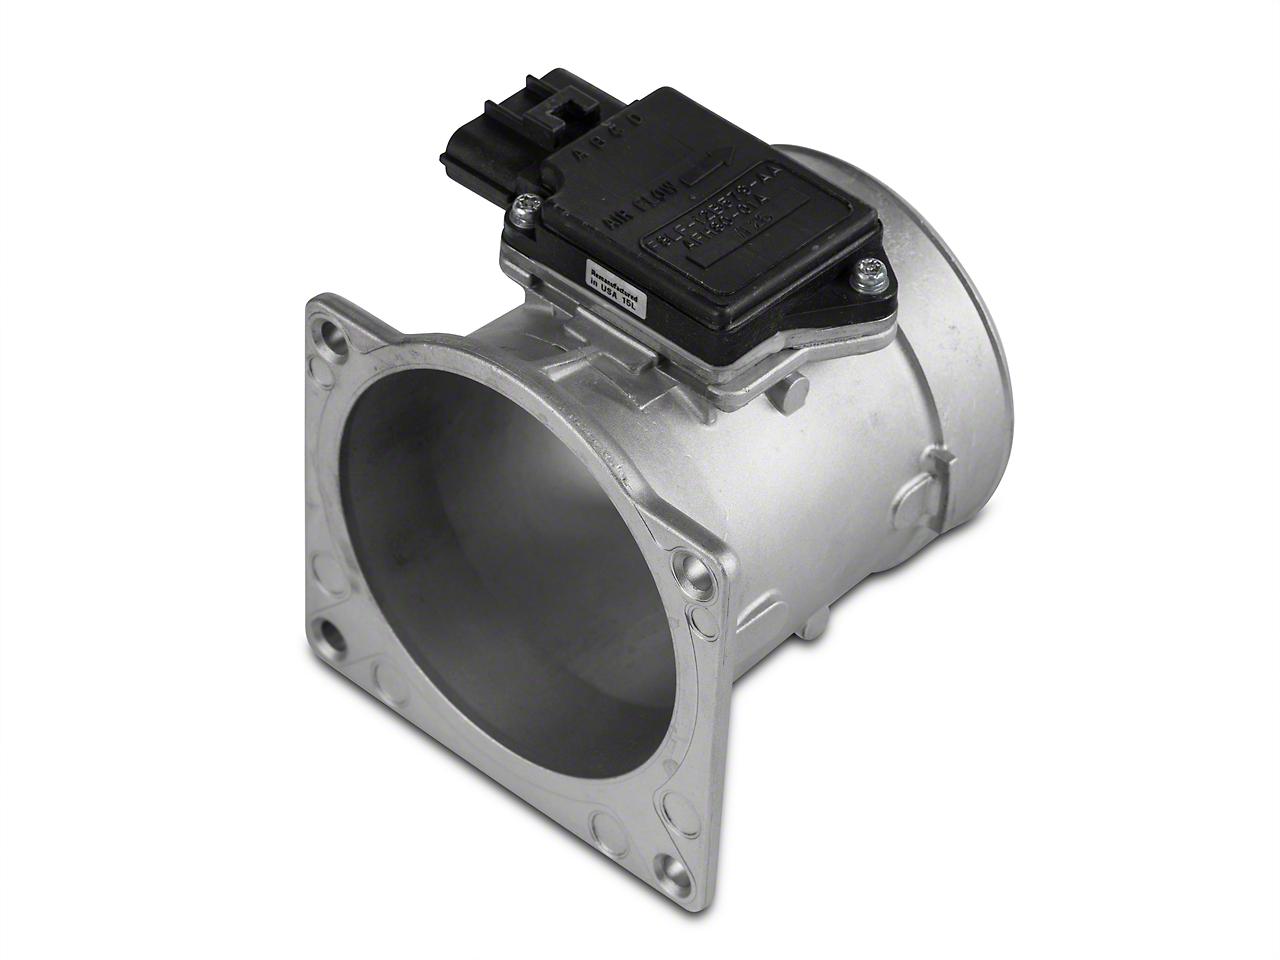 Ford MAF Sensor (97-98 4.6L, 5.4L)